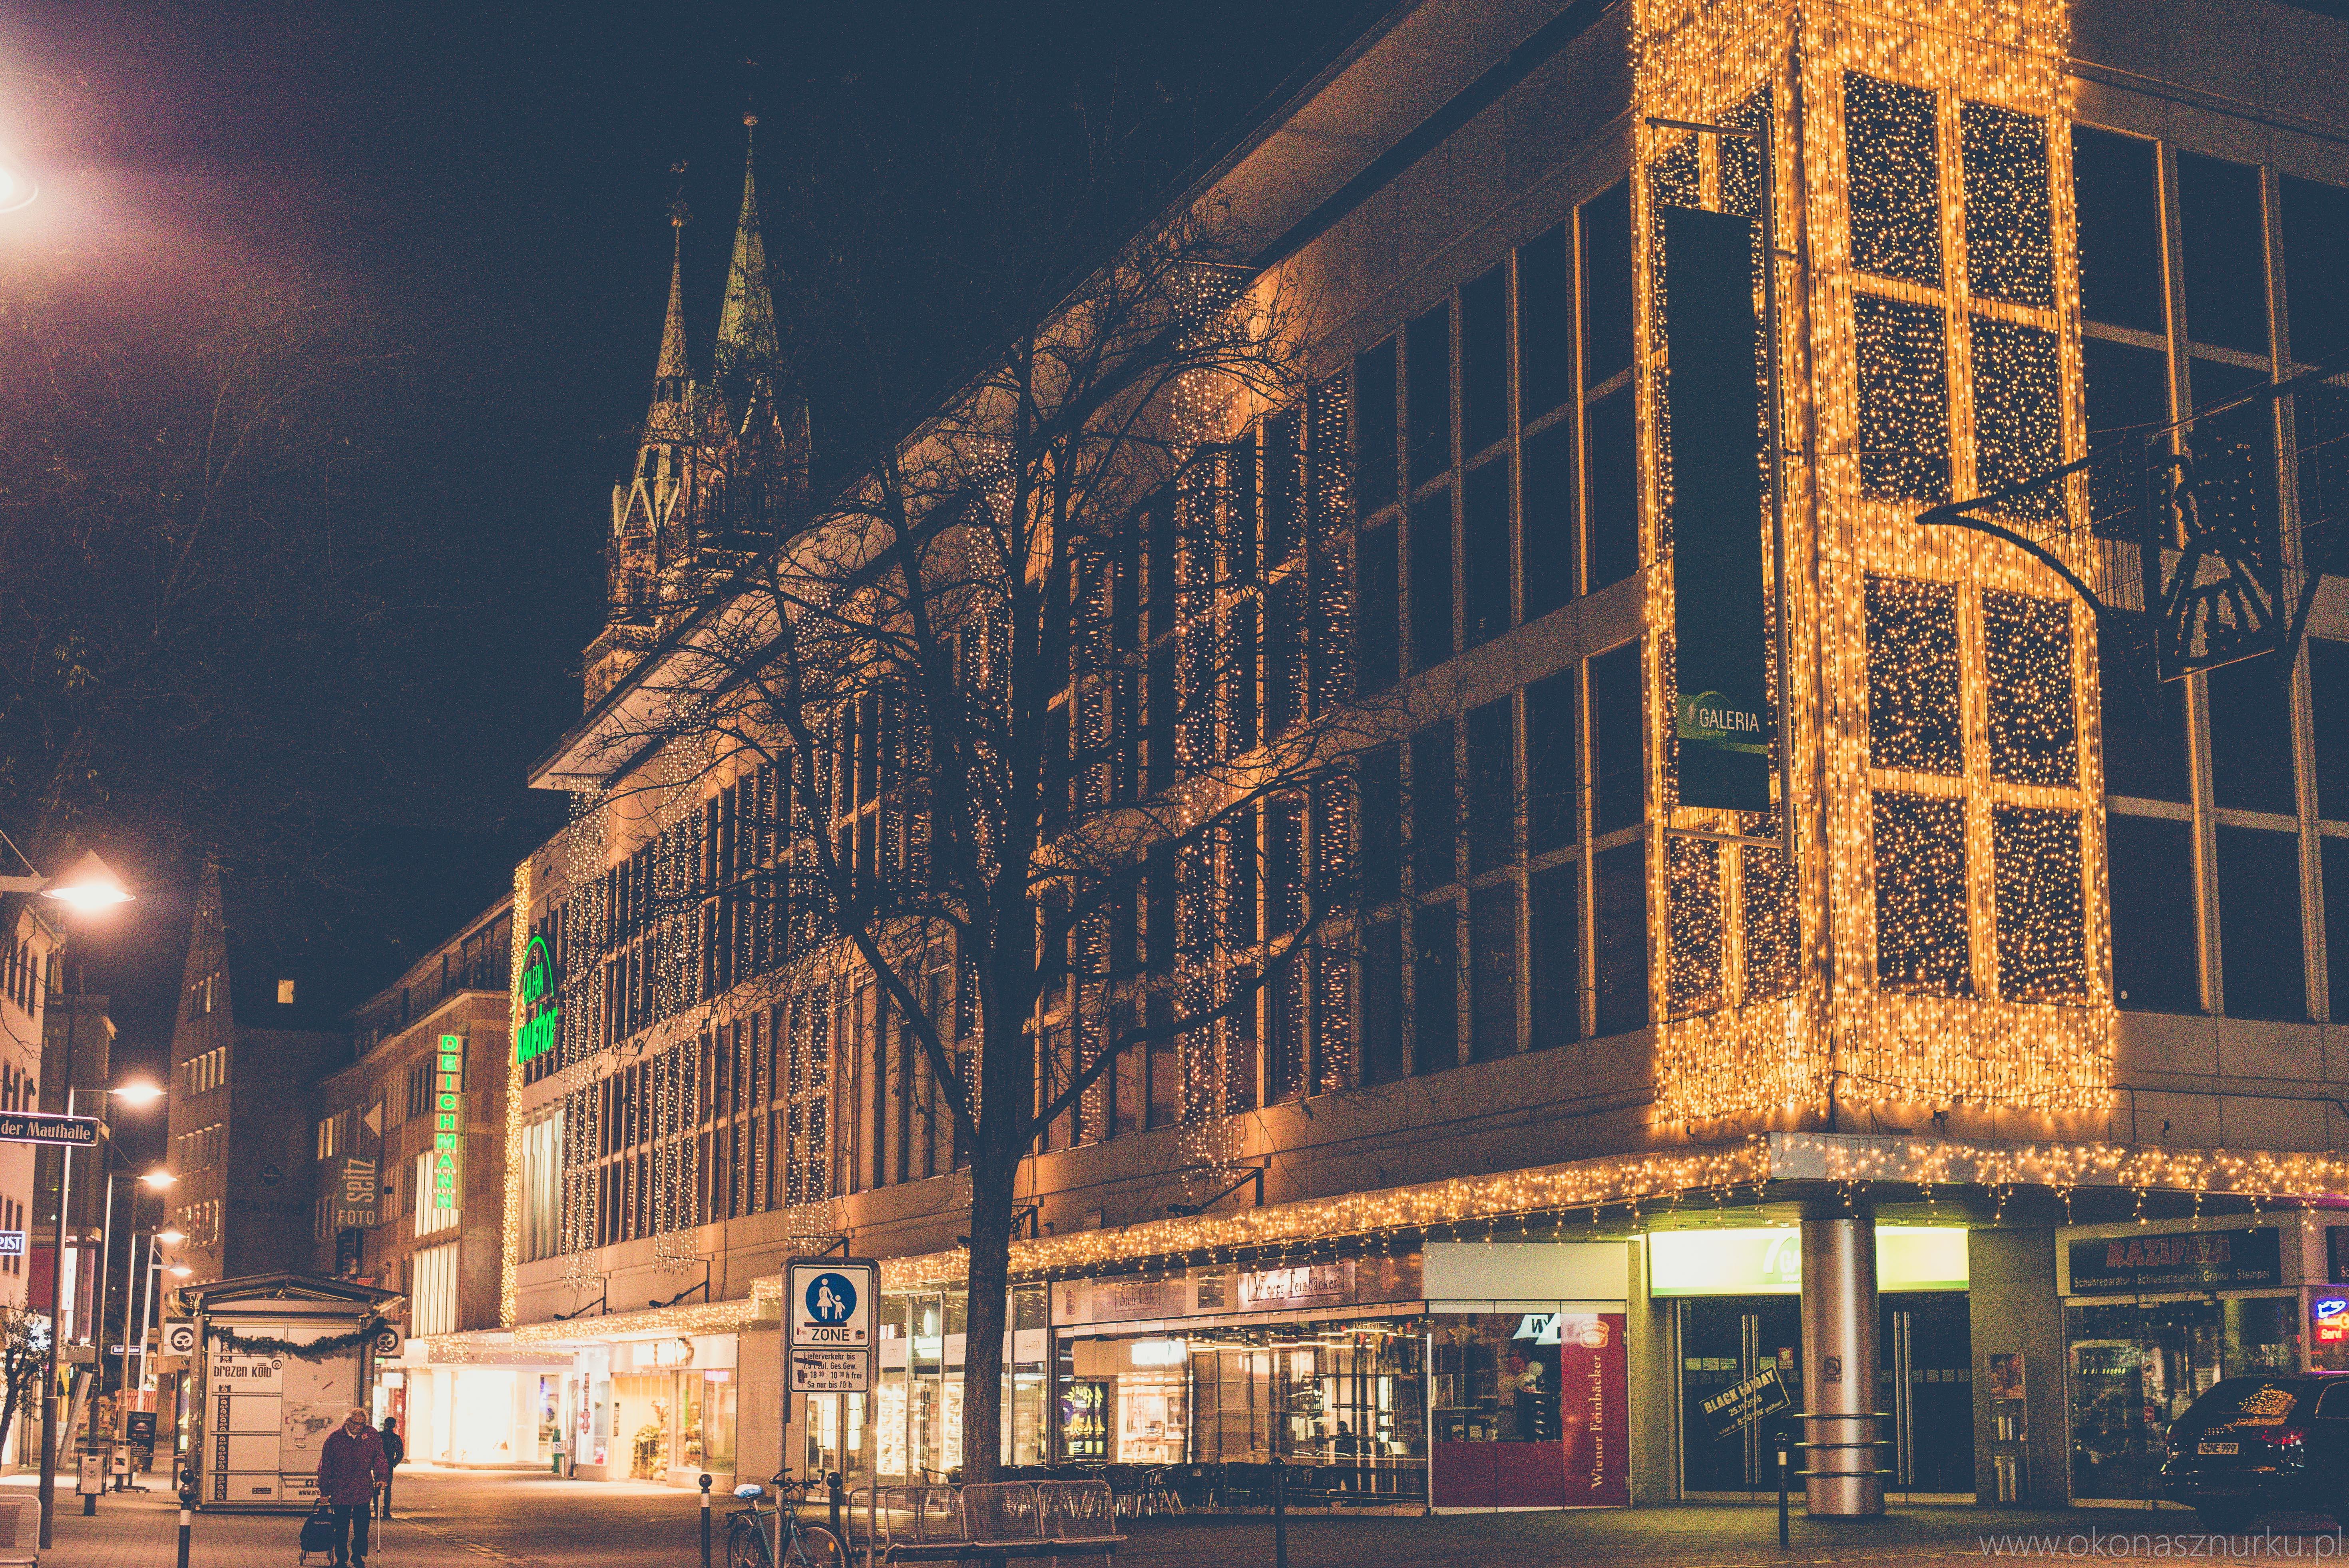 Nürnberg-stadt-norymberga-bayern-city-frankonia (30)